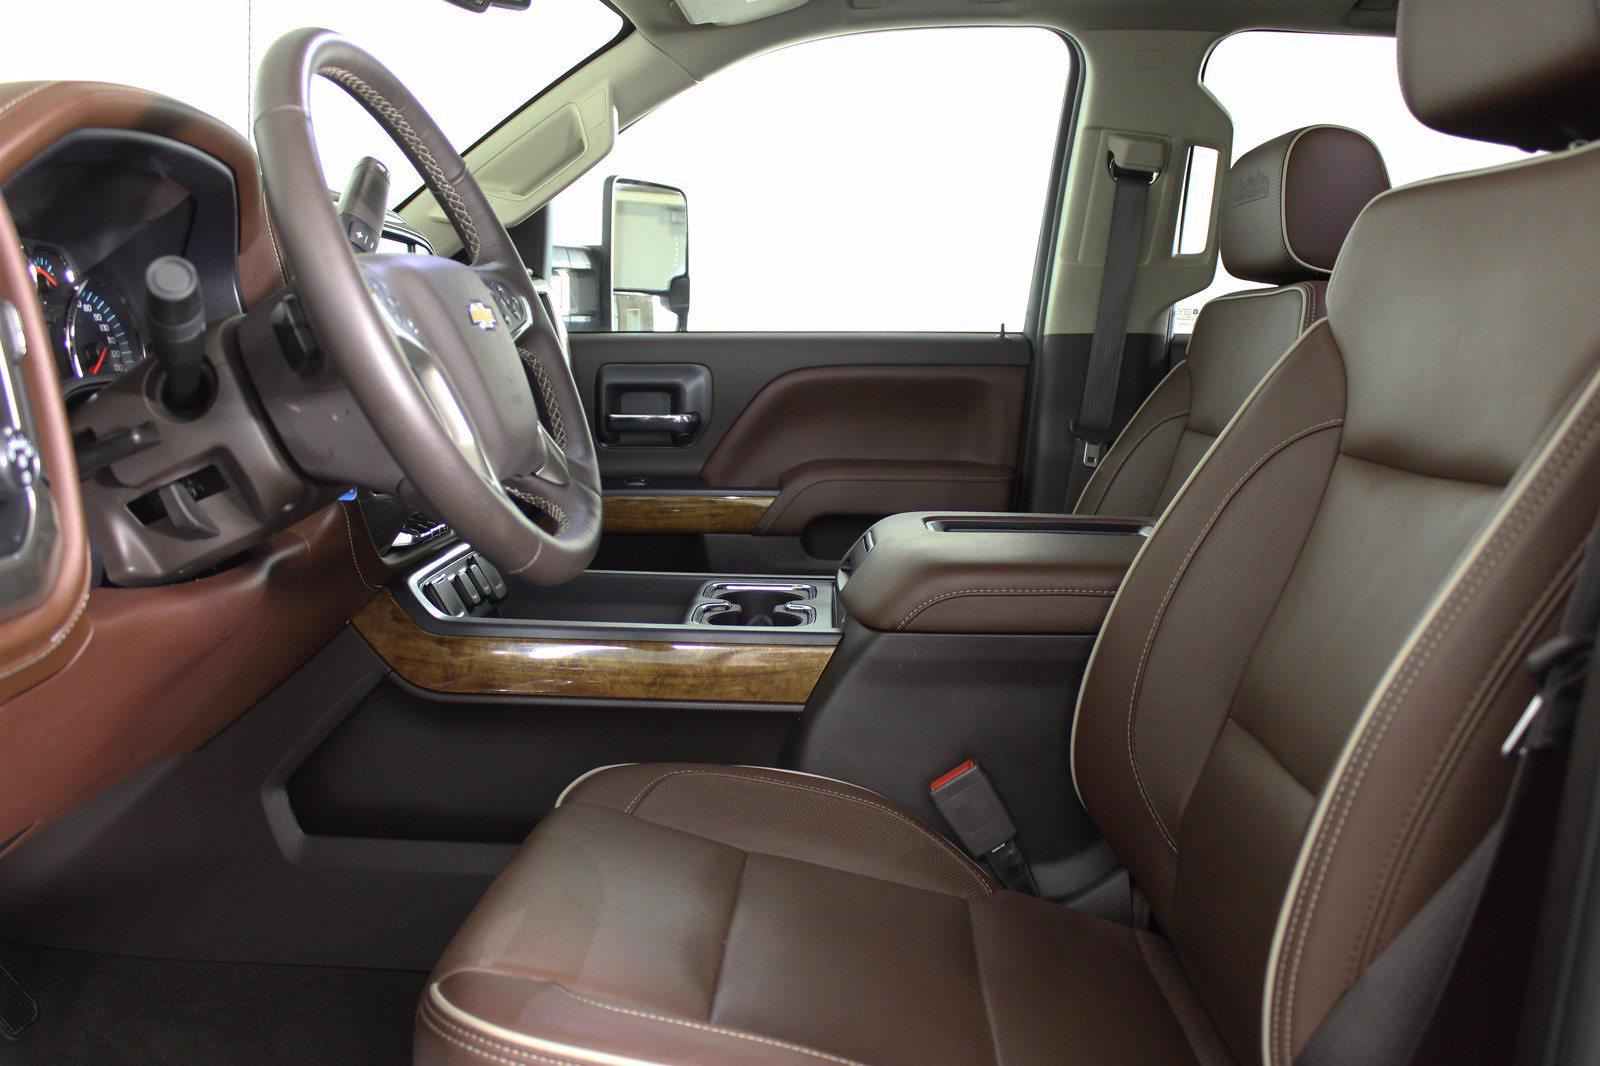 2018 Chevrolet Silverado 3500 Crew Cab 4x4, Pickup #DU90958 - photo 16